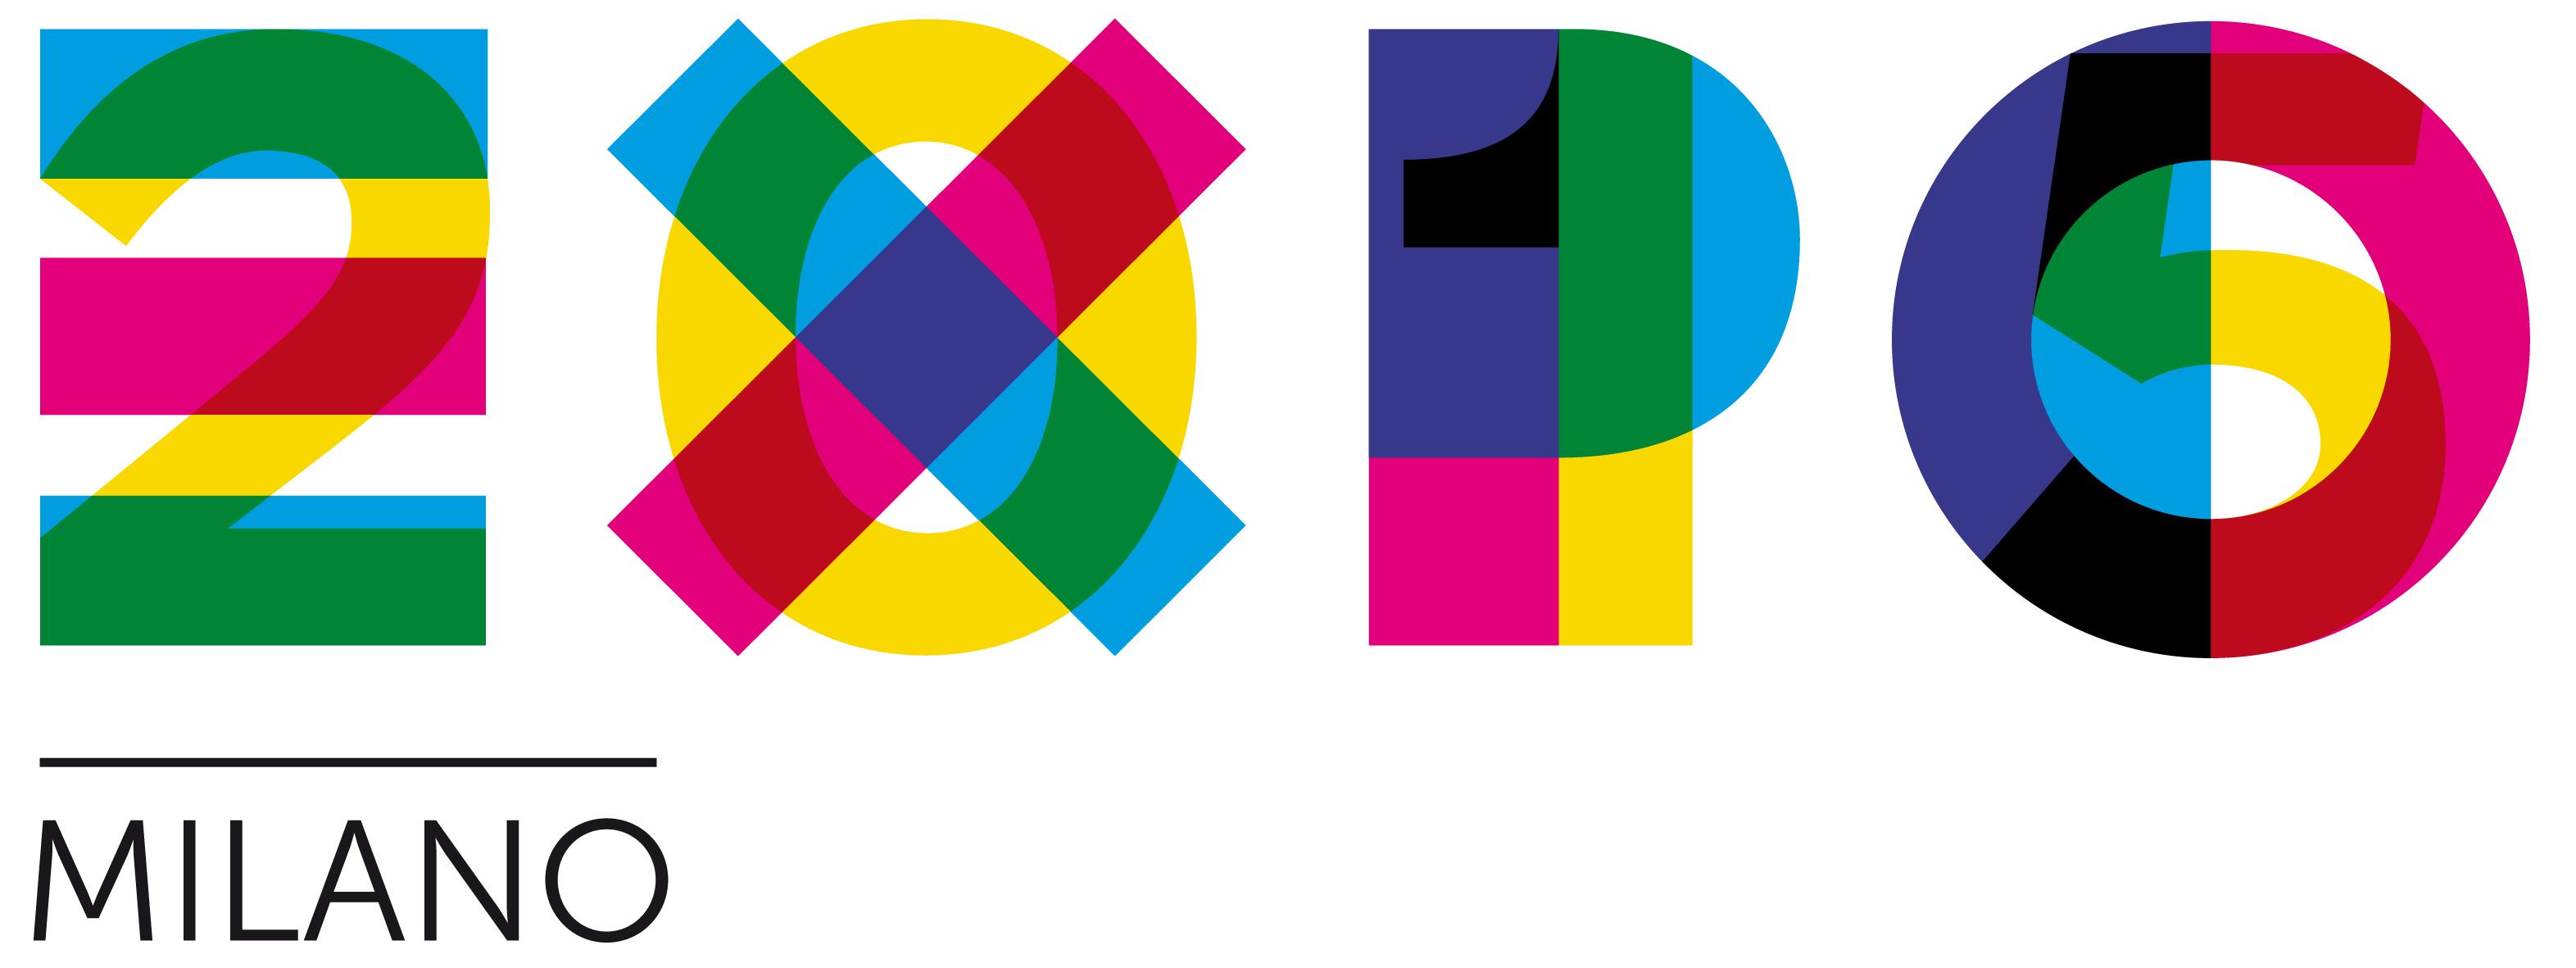 10 curiosità su Expo 2015